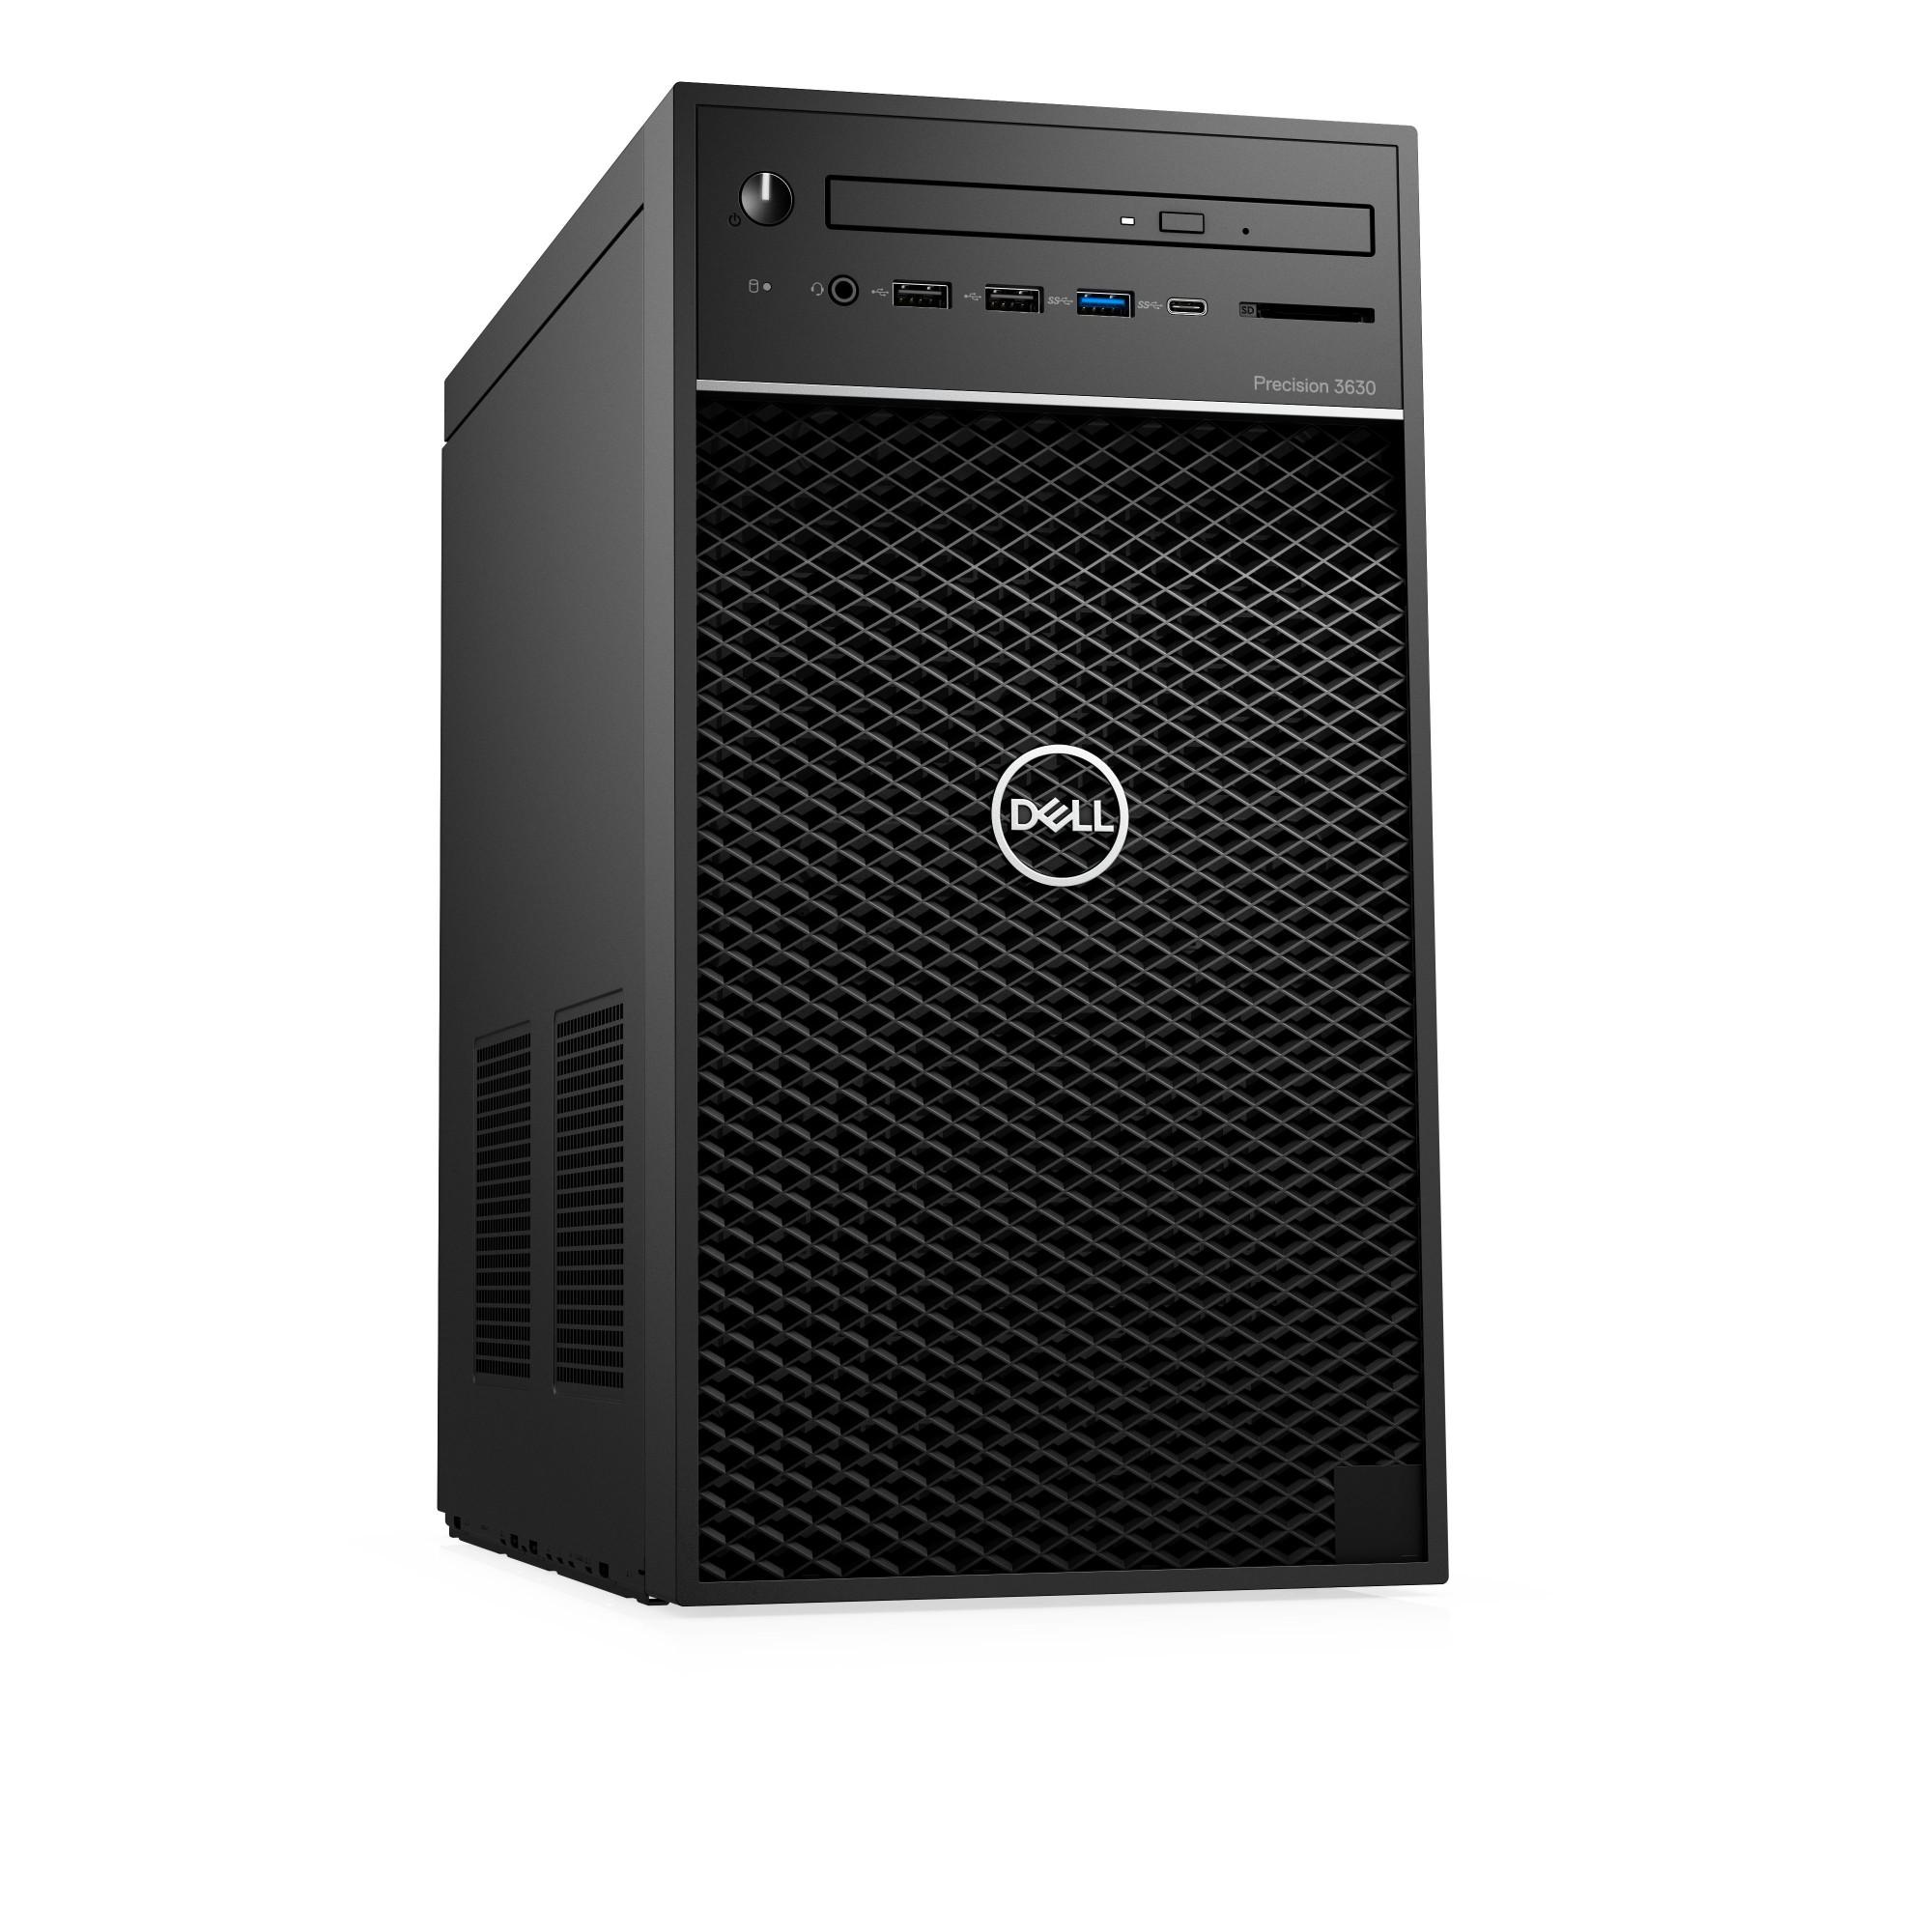 DELL Precision T3630 8th gen Intel® Core™ i7 i7-8700K 32 GB DDR4-SDRAM 1512  GB HDD+SSD Black Tower Workstation